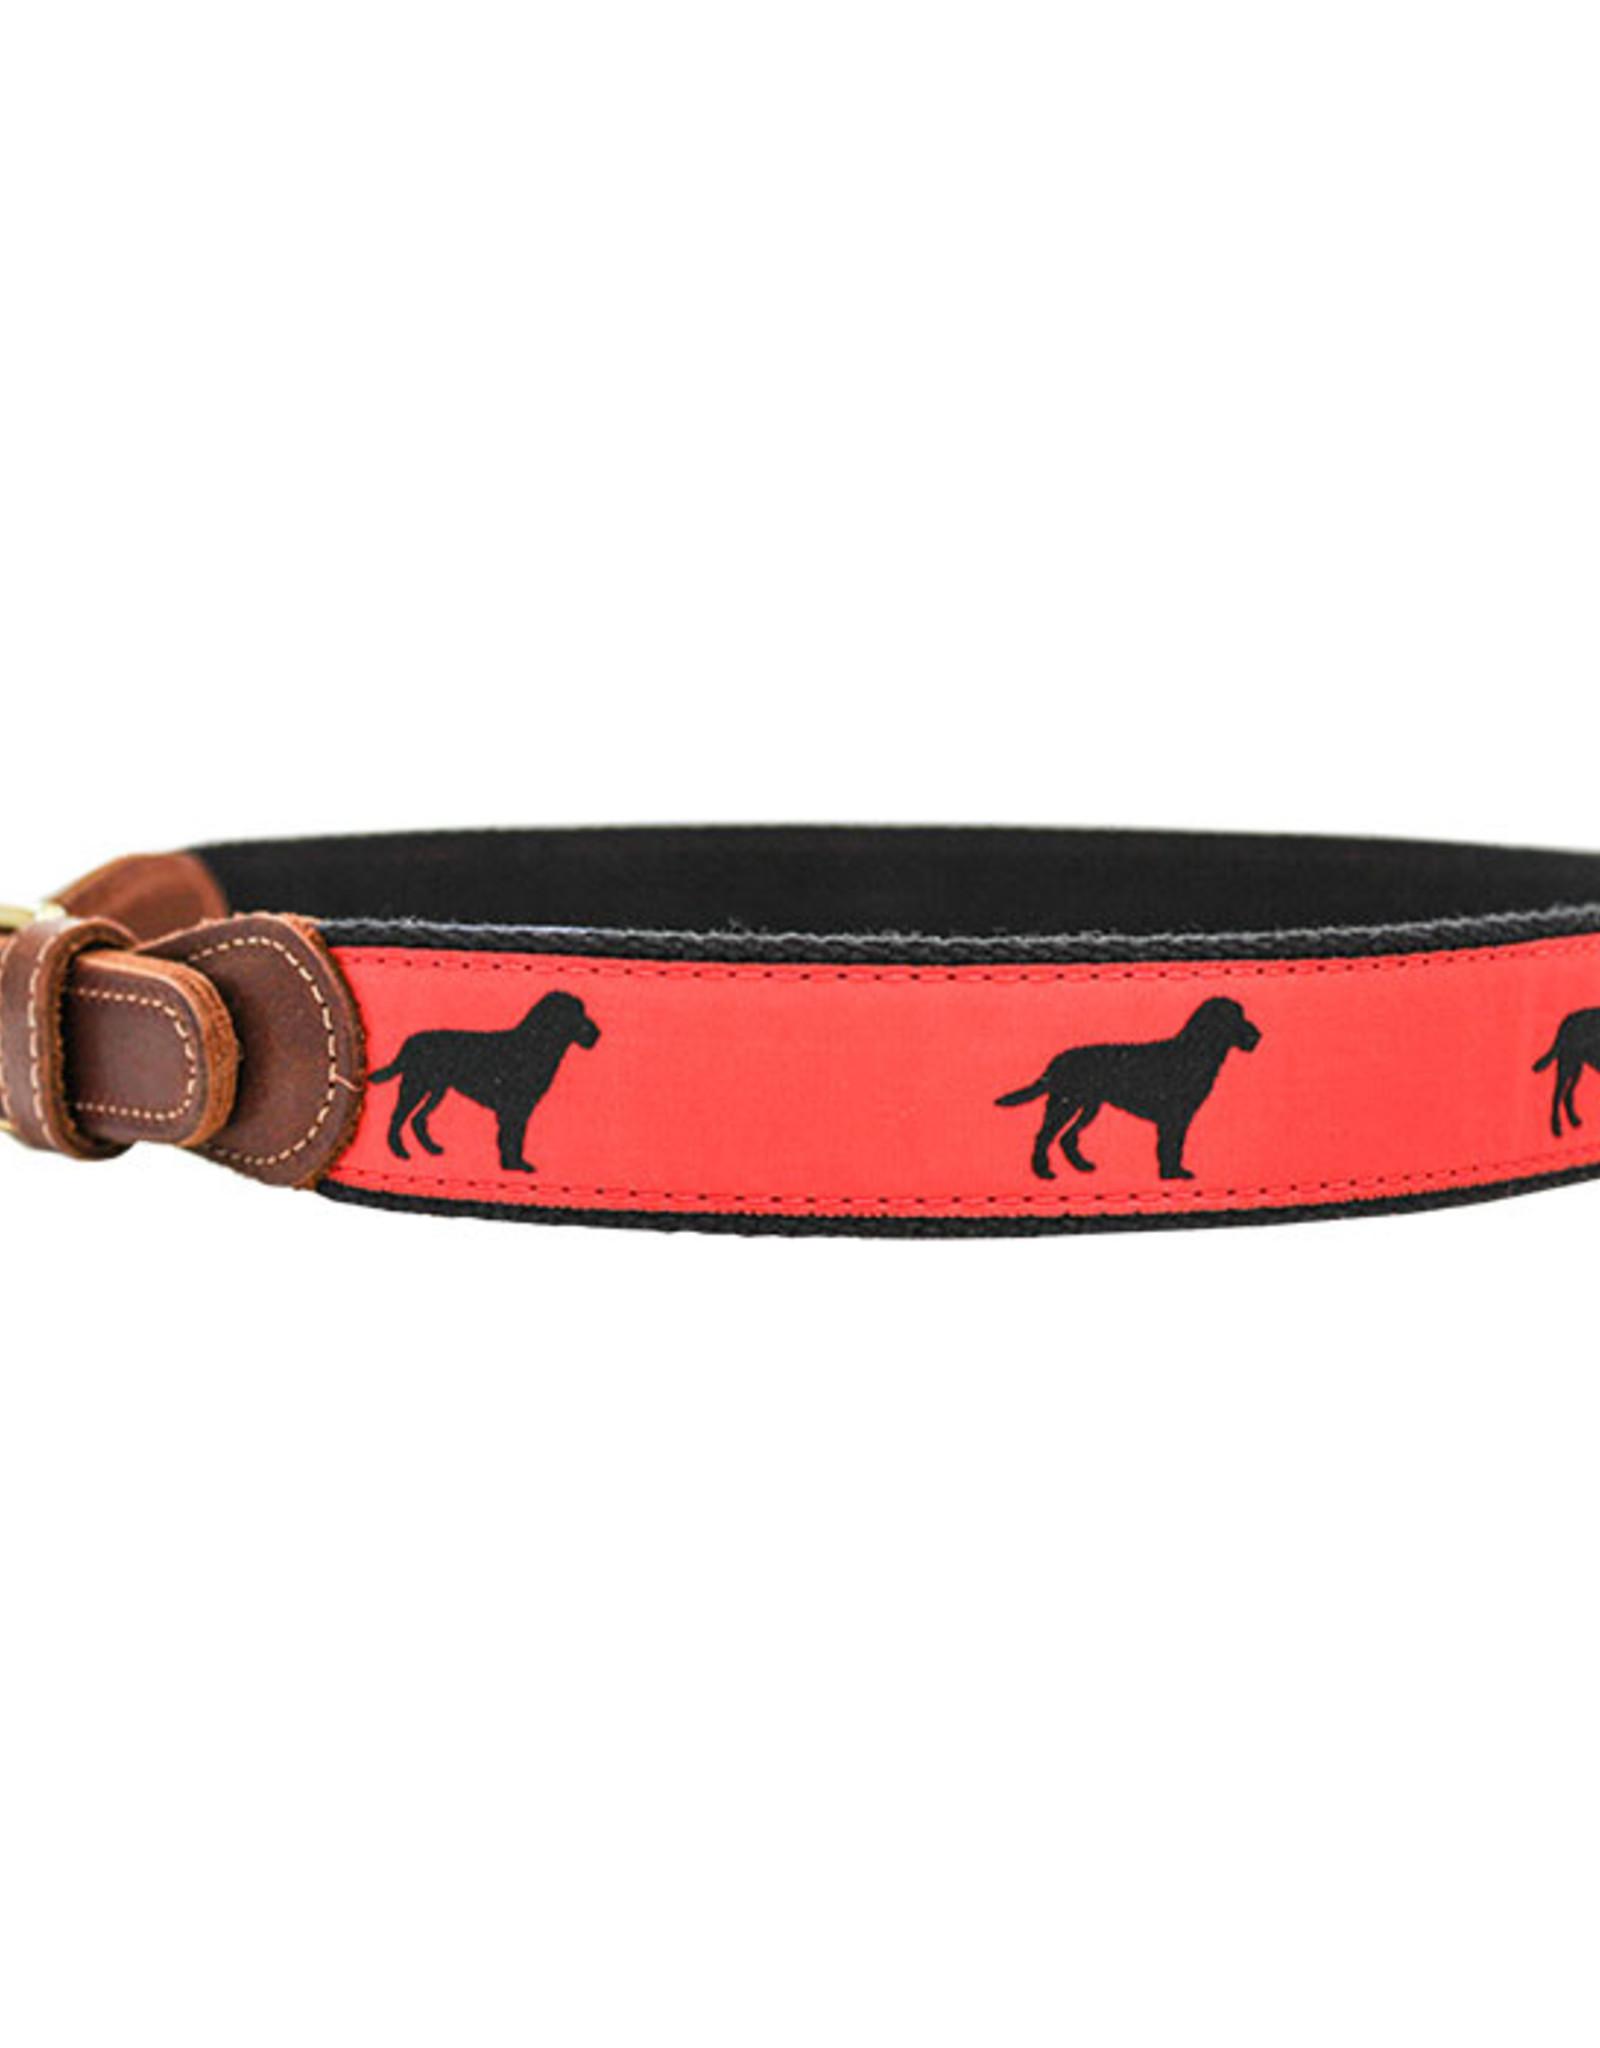 The Bailey Boys Black Dog Belt